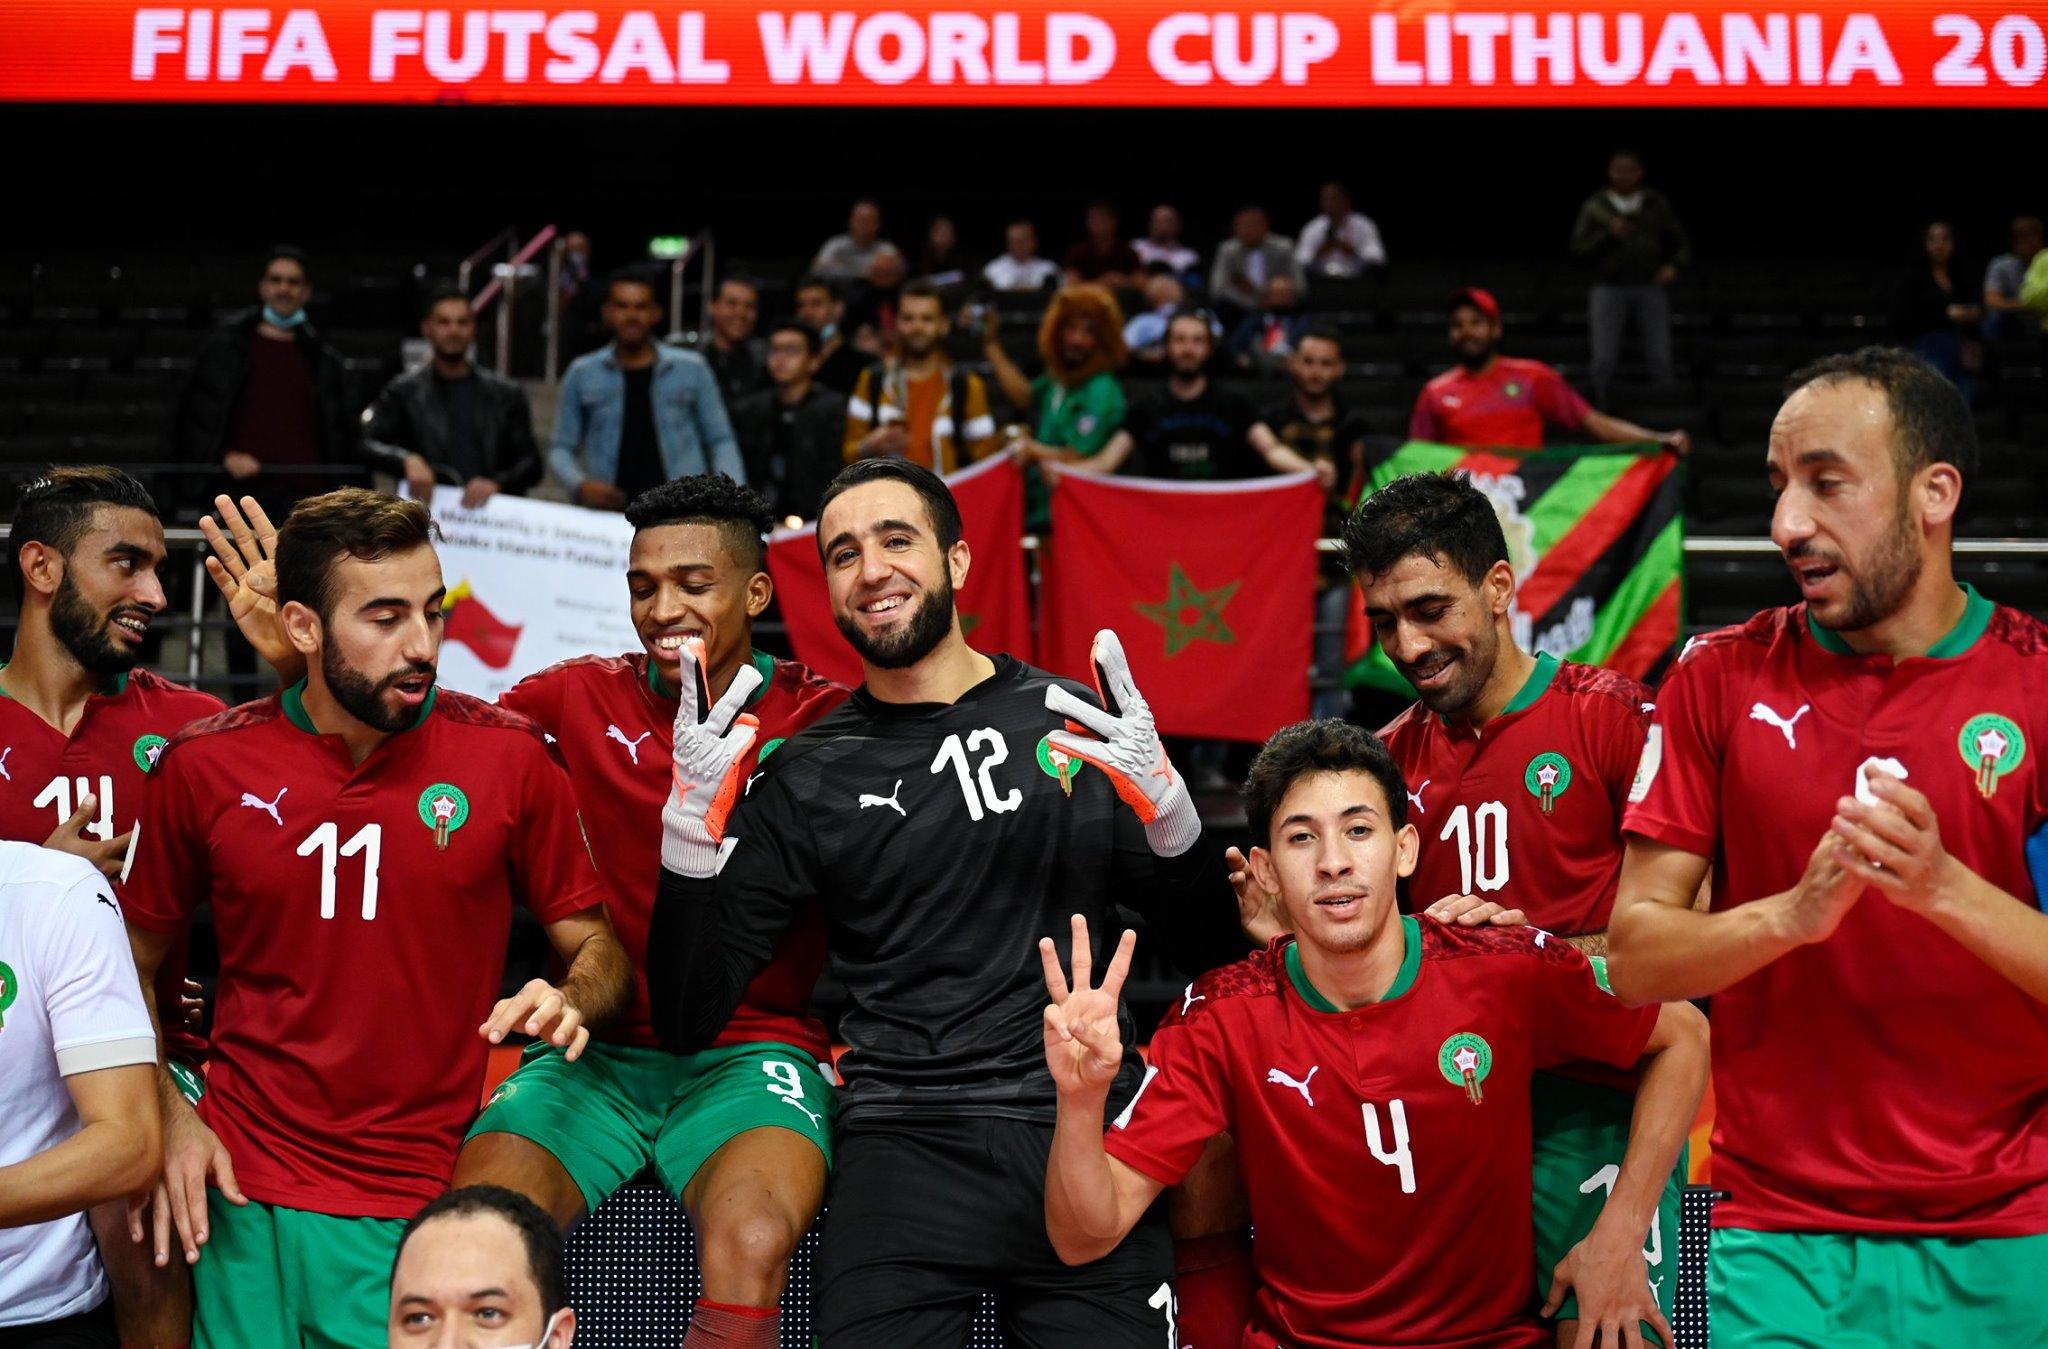 Futsal WC 2021 Knockouts – Προκρίσεις για Ρωσία και Μαρόκο